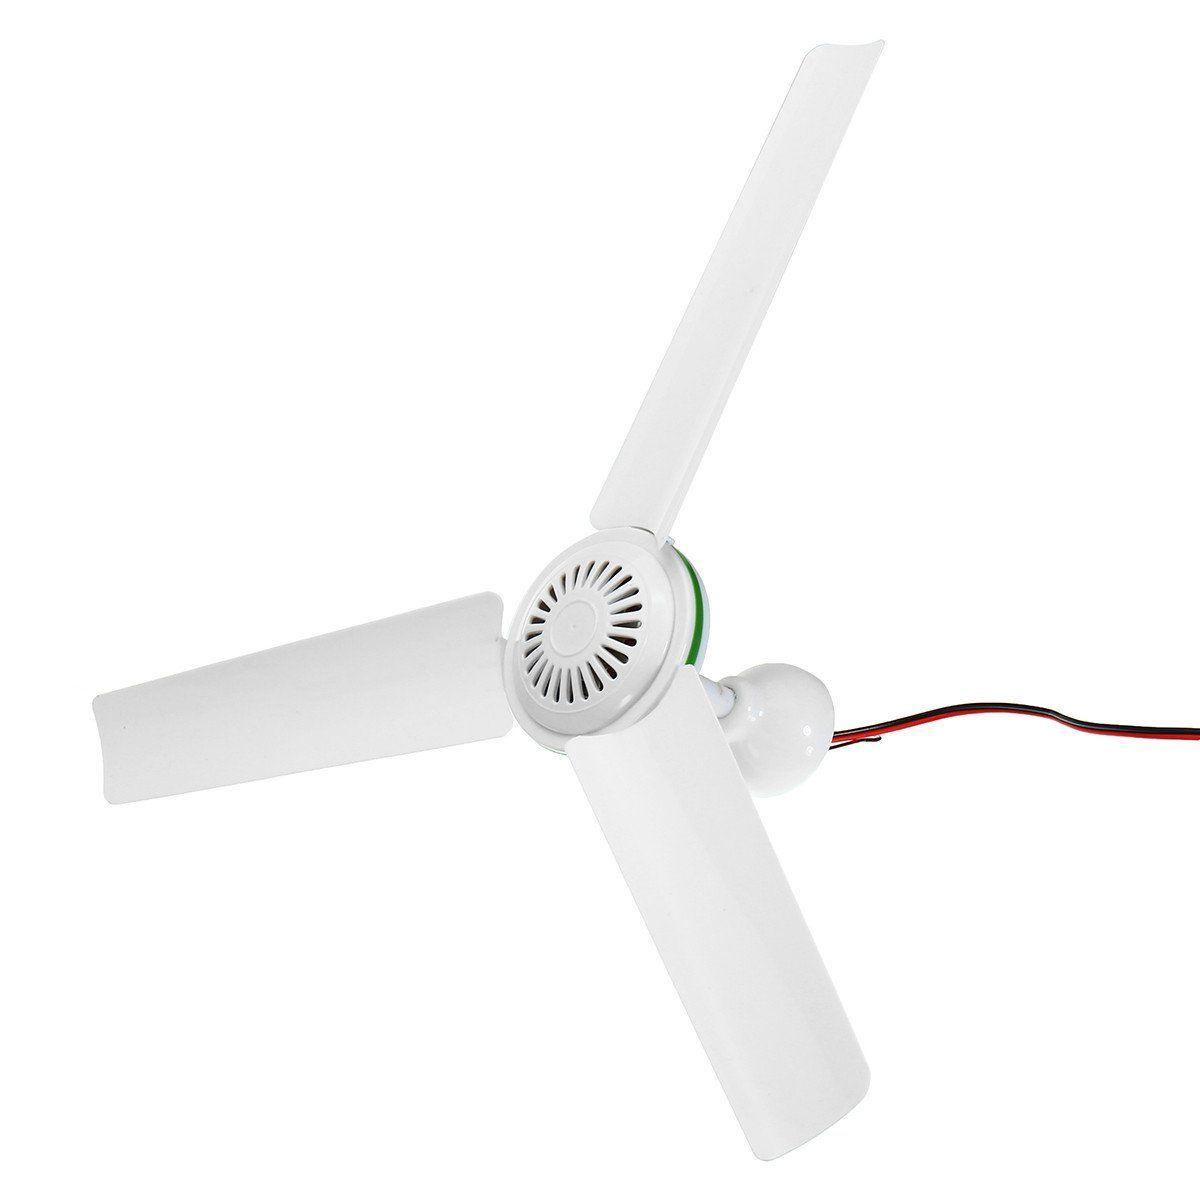 Dc 24v Solar Power Ceiling Fan Portable Solar Fan With Switch 3